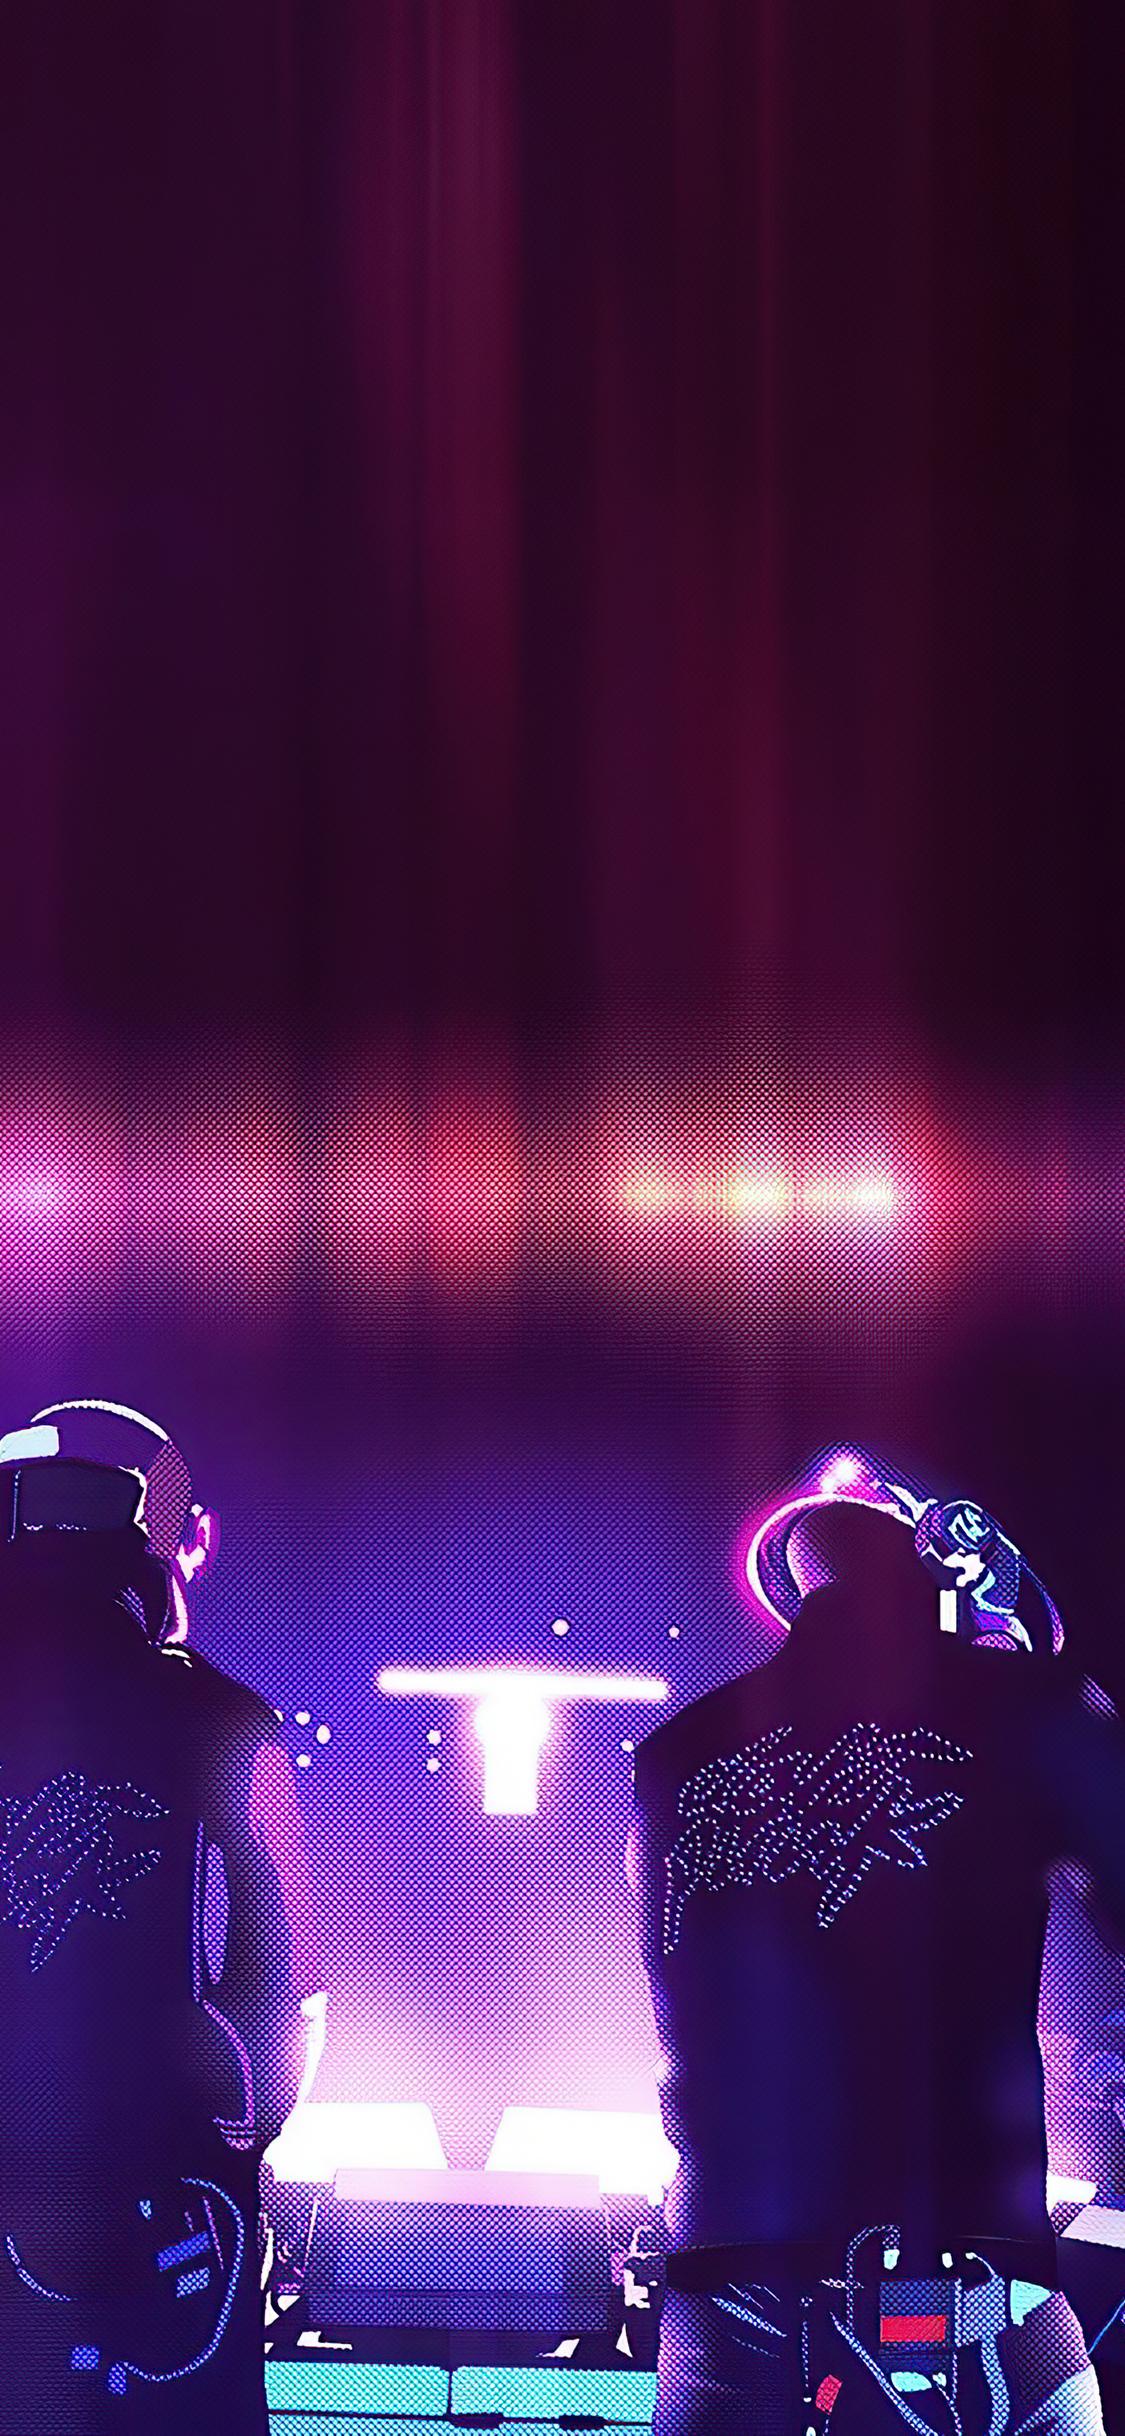 1125x2436 Daft Punk Dj 4k Iphone XS,Iphone 10,Iphone X HD ...